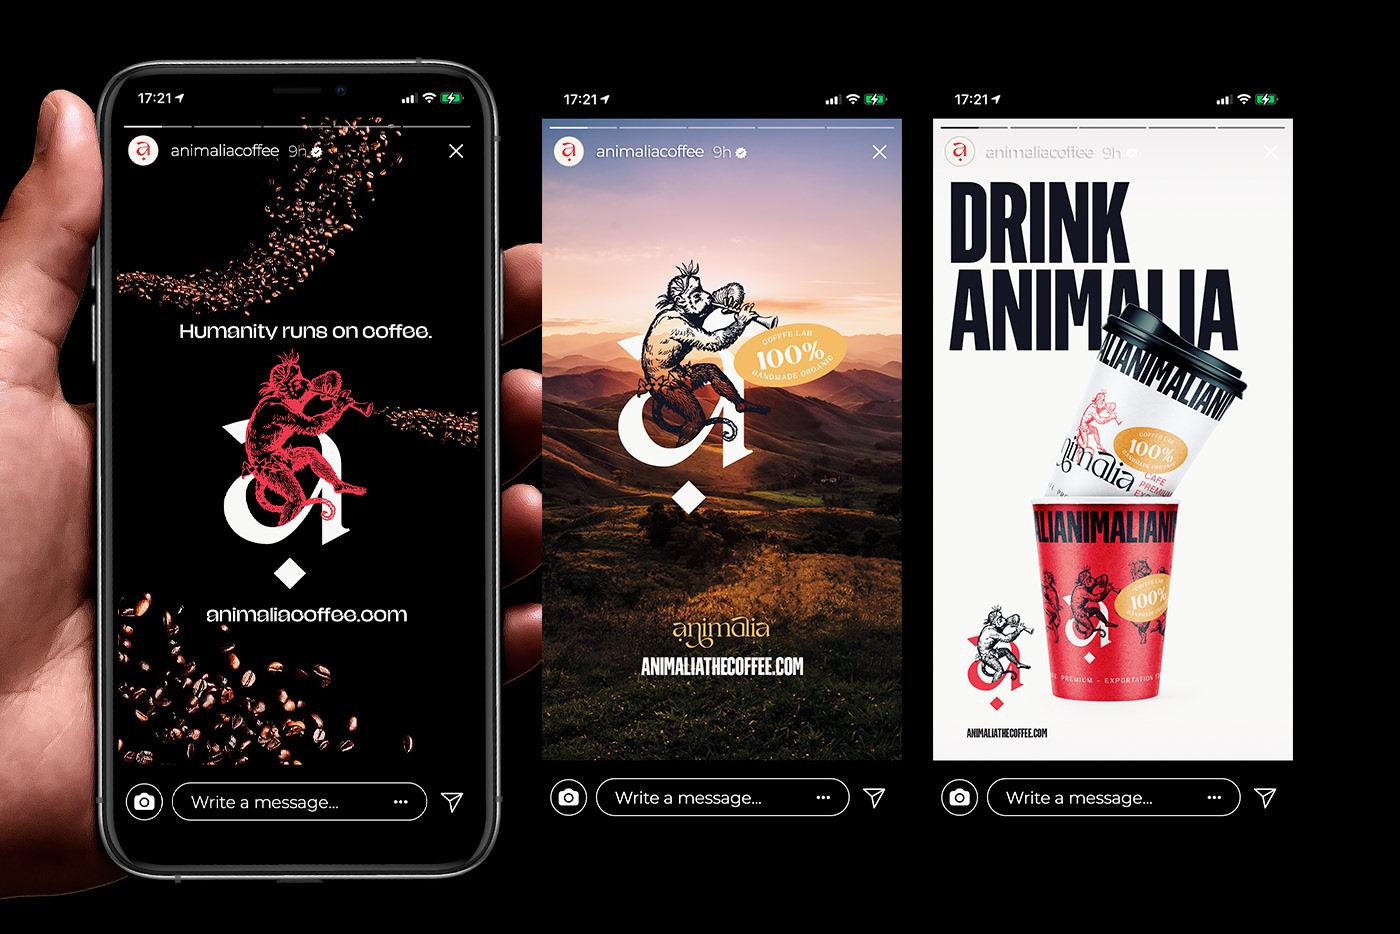 Animalia coffee branding and packaging design by Matheus Cornelius